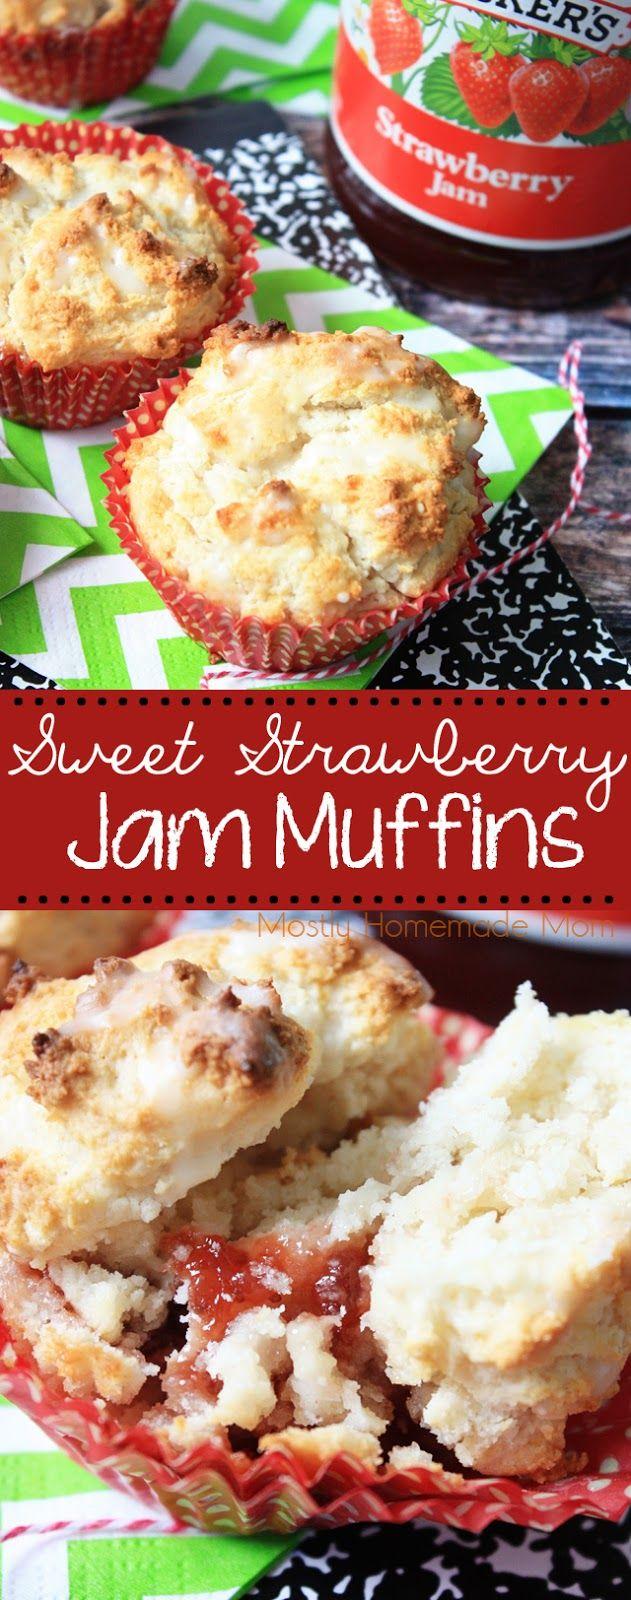 Sweet Strawberry Jam Muffins